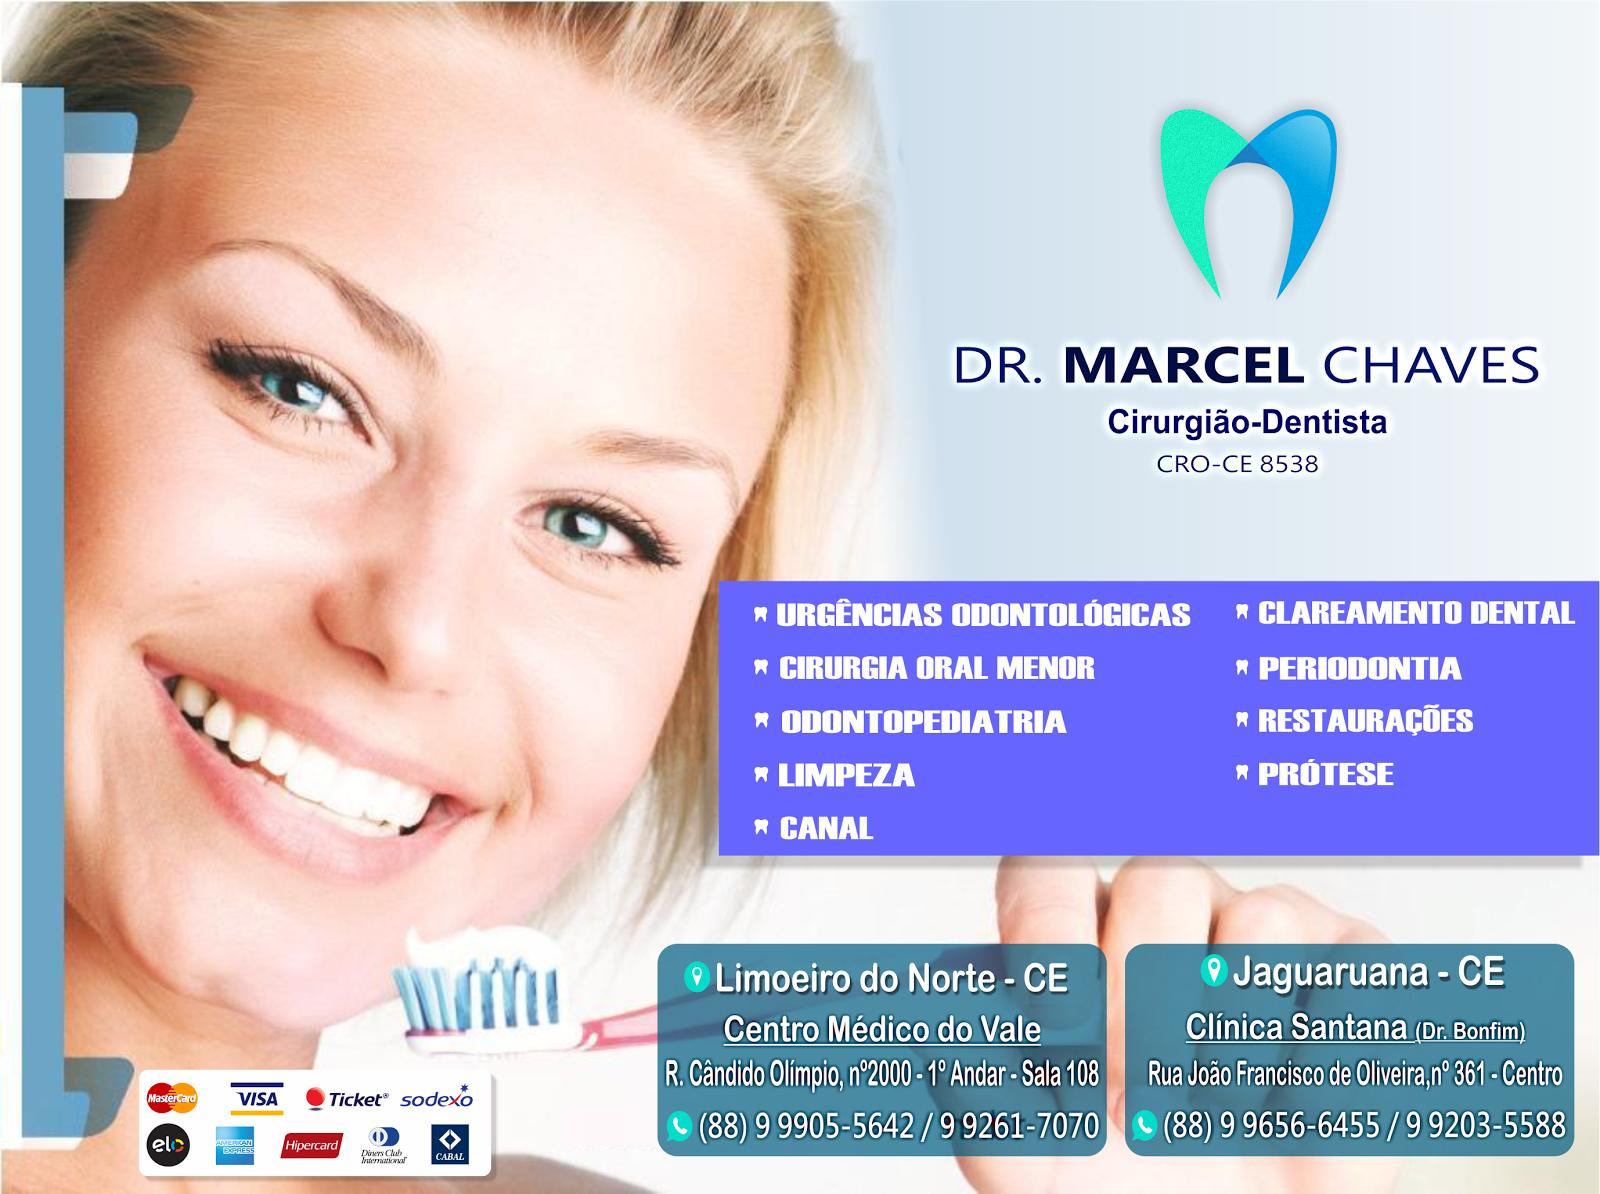 Dr Marcel Chaves